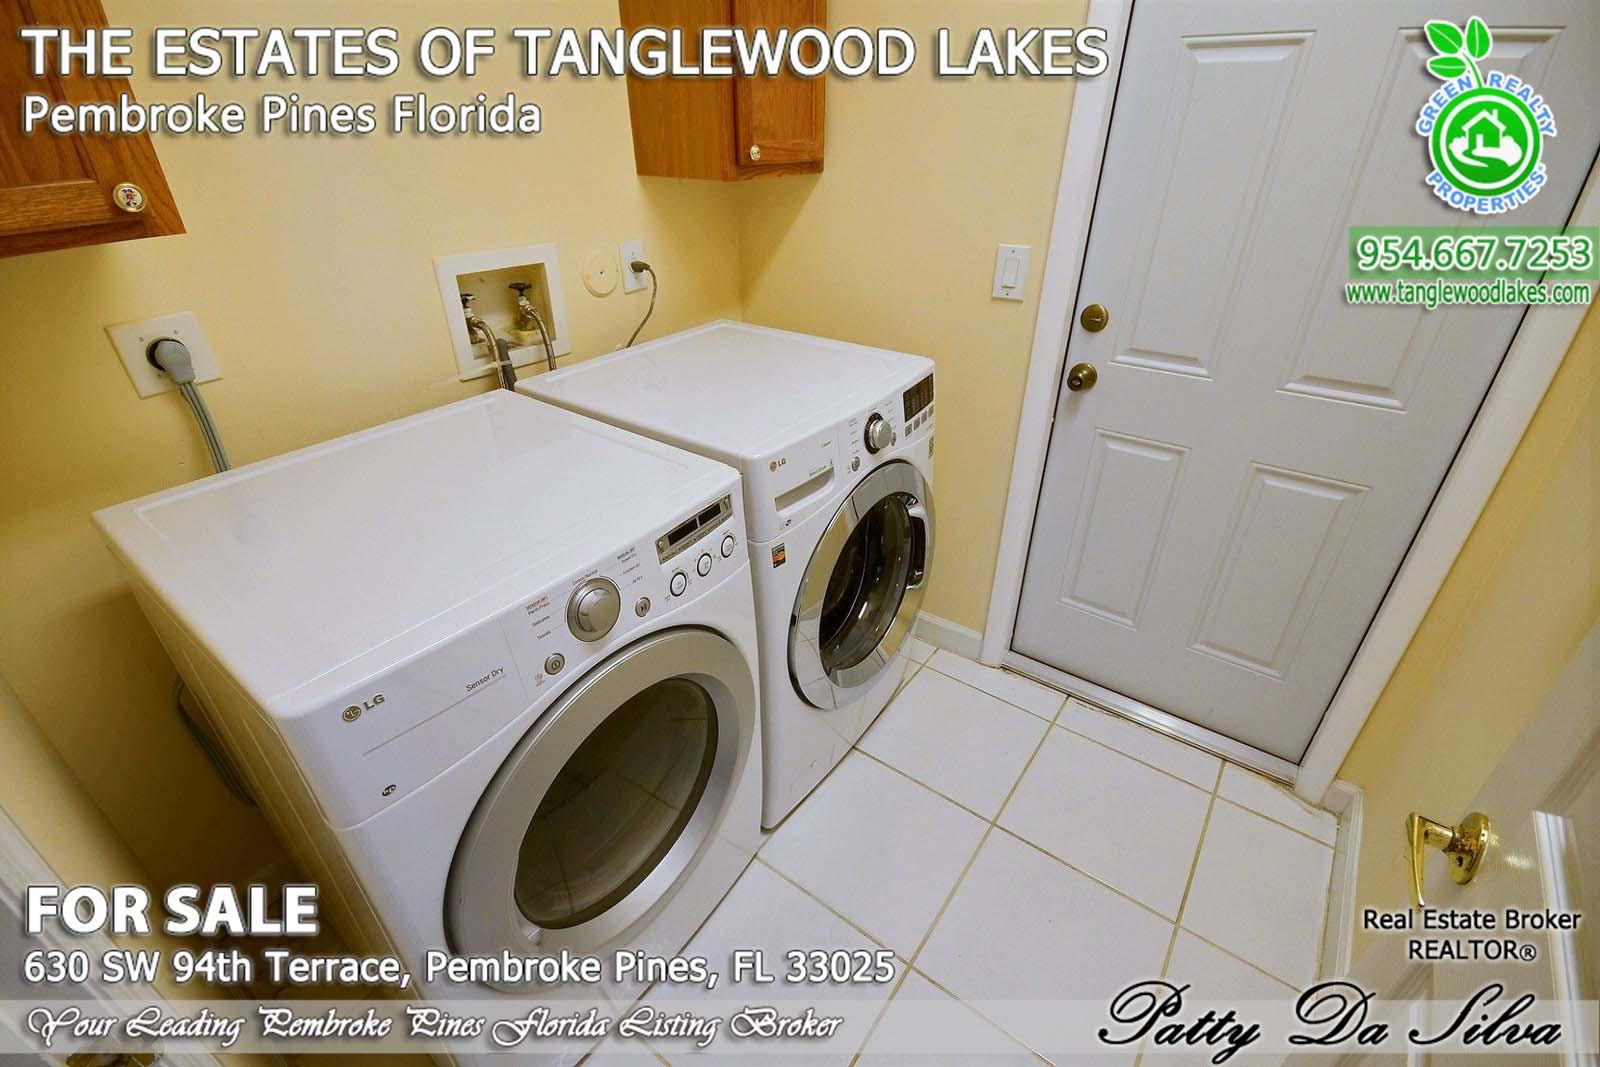 Tanglewood Lakes Pembroke Pines